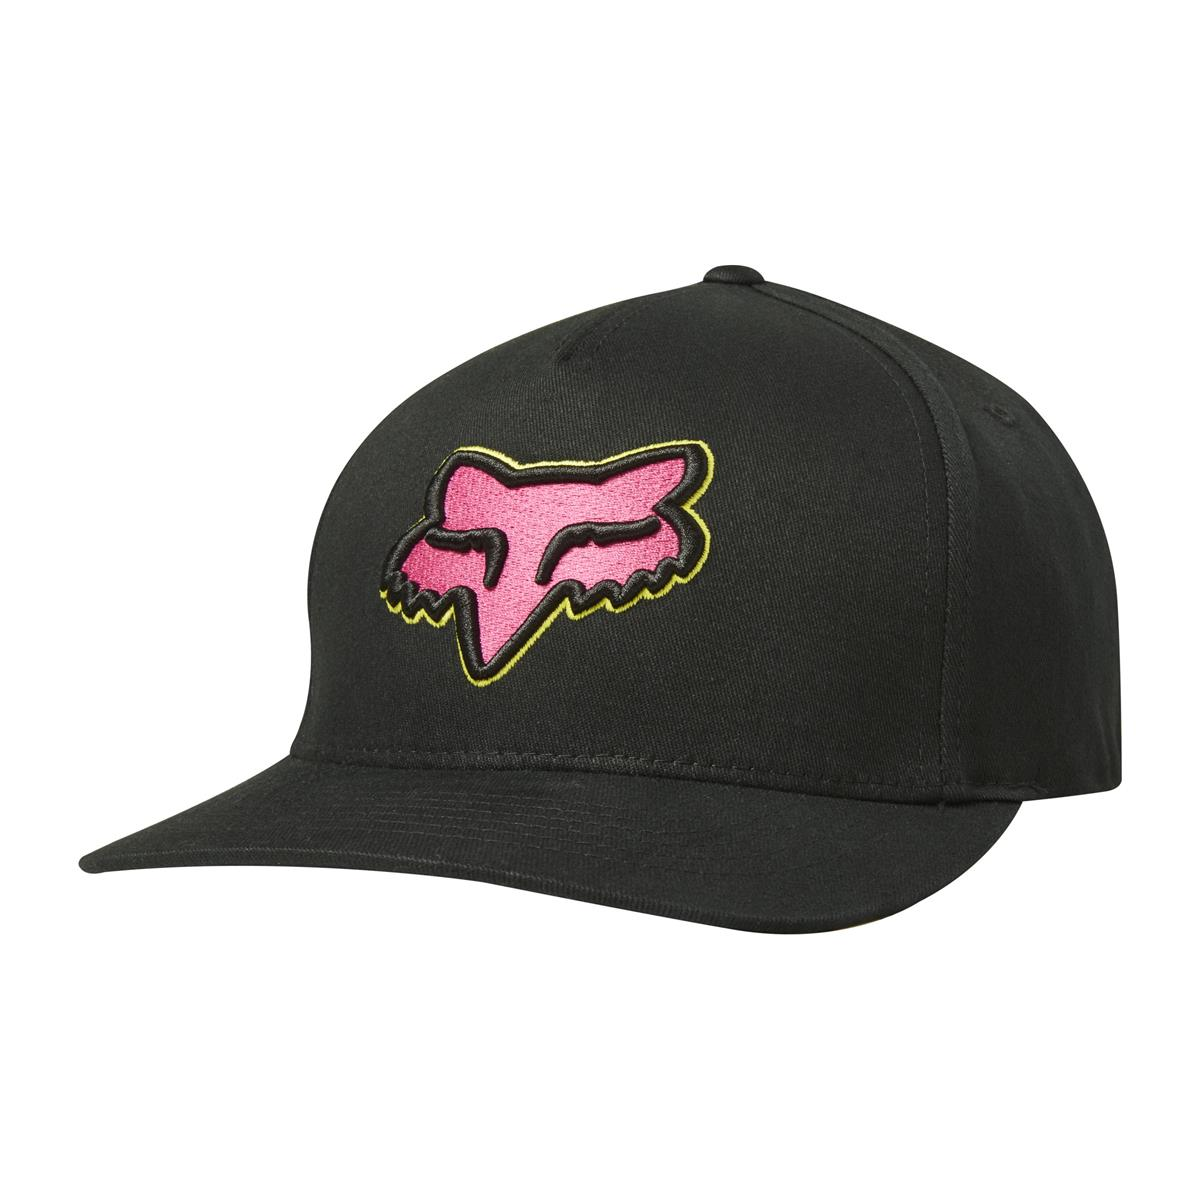 Fox Flexfit Cap Epicycle Limited Edition A1 - Schwarz/Pink